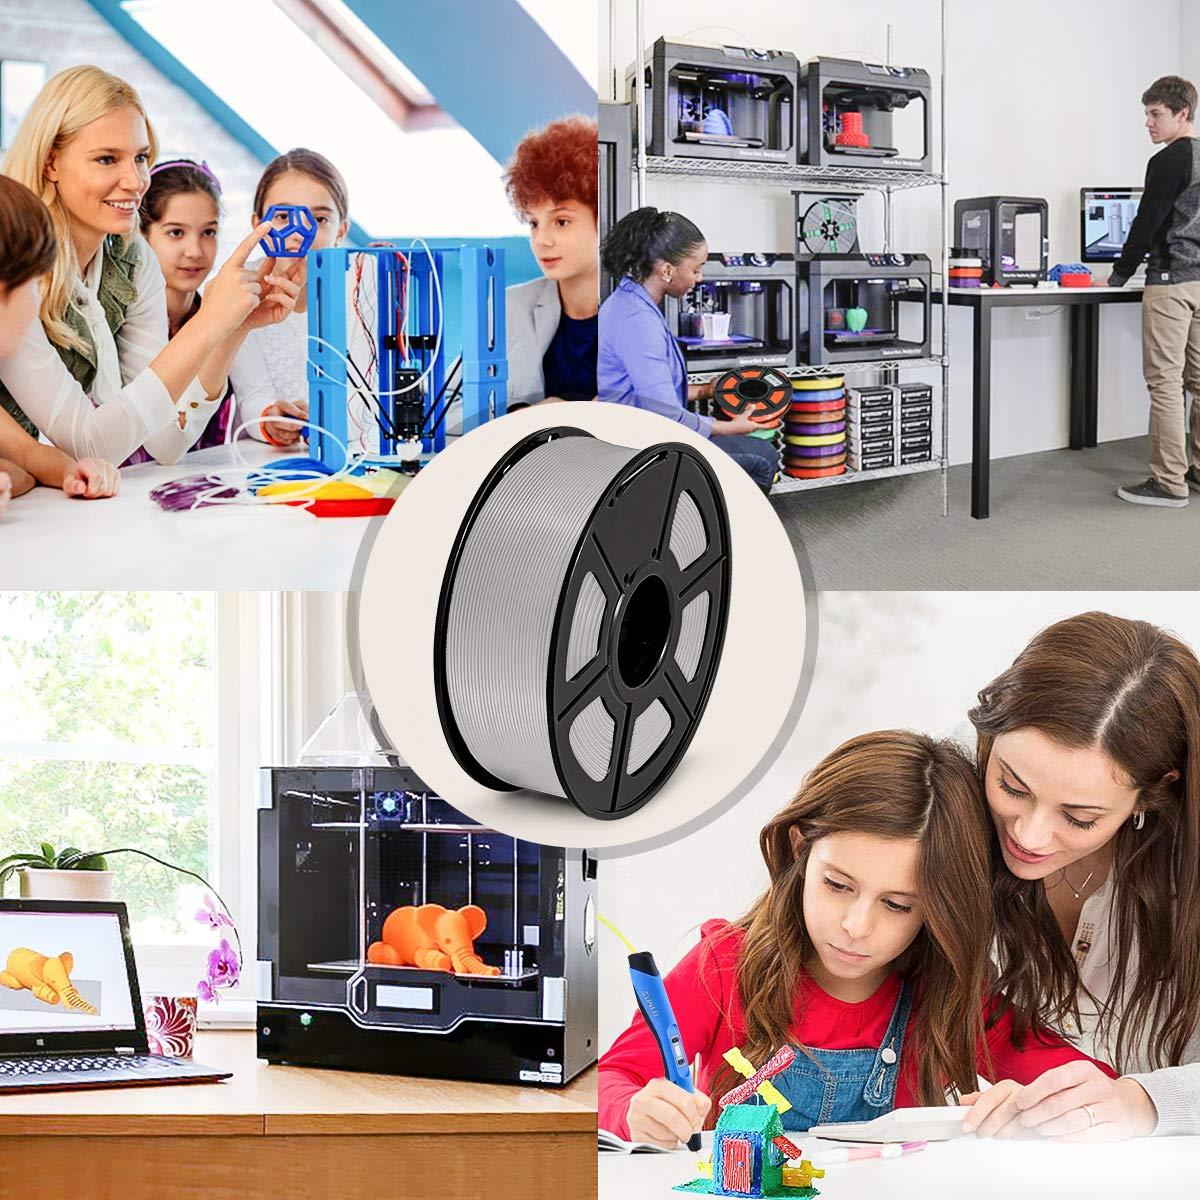 // ABS Negro Precisi/ón Dimensional 0.02 mm SUNLU Filamento ABS 1.75mm 1kg Impresora 3D Filamento